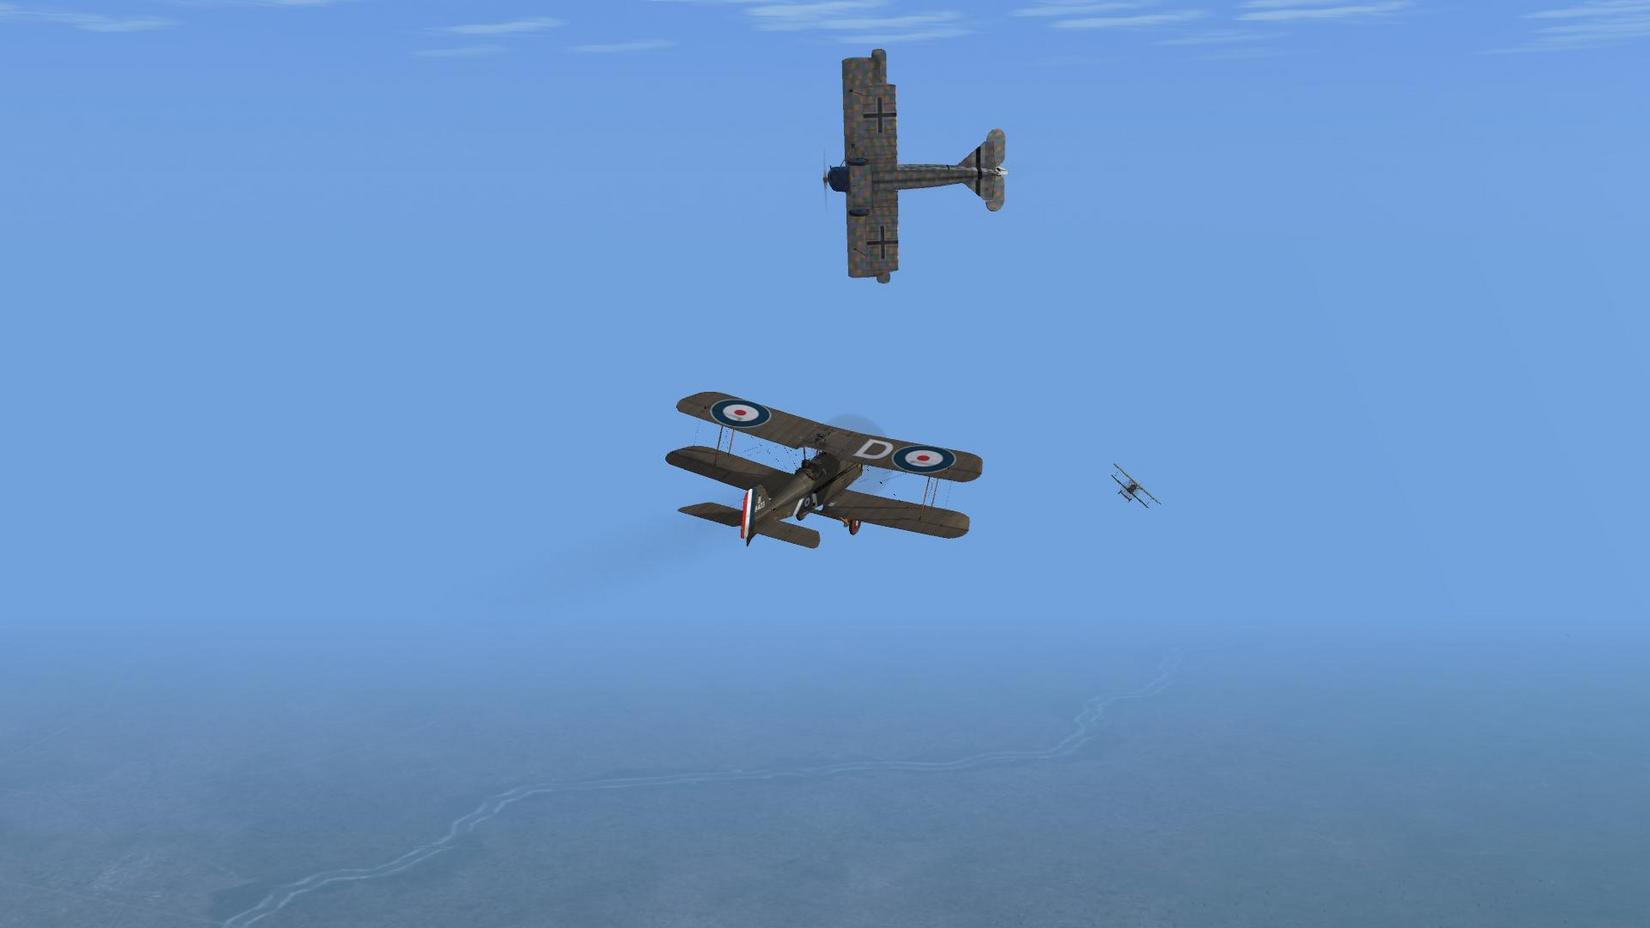 woff ue flight sim torrent full game and crack